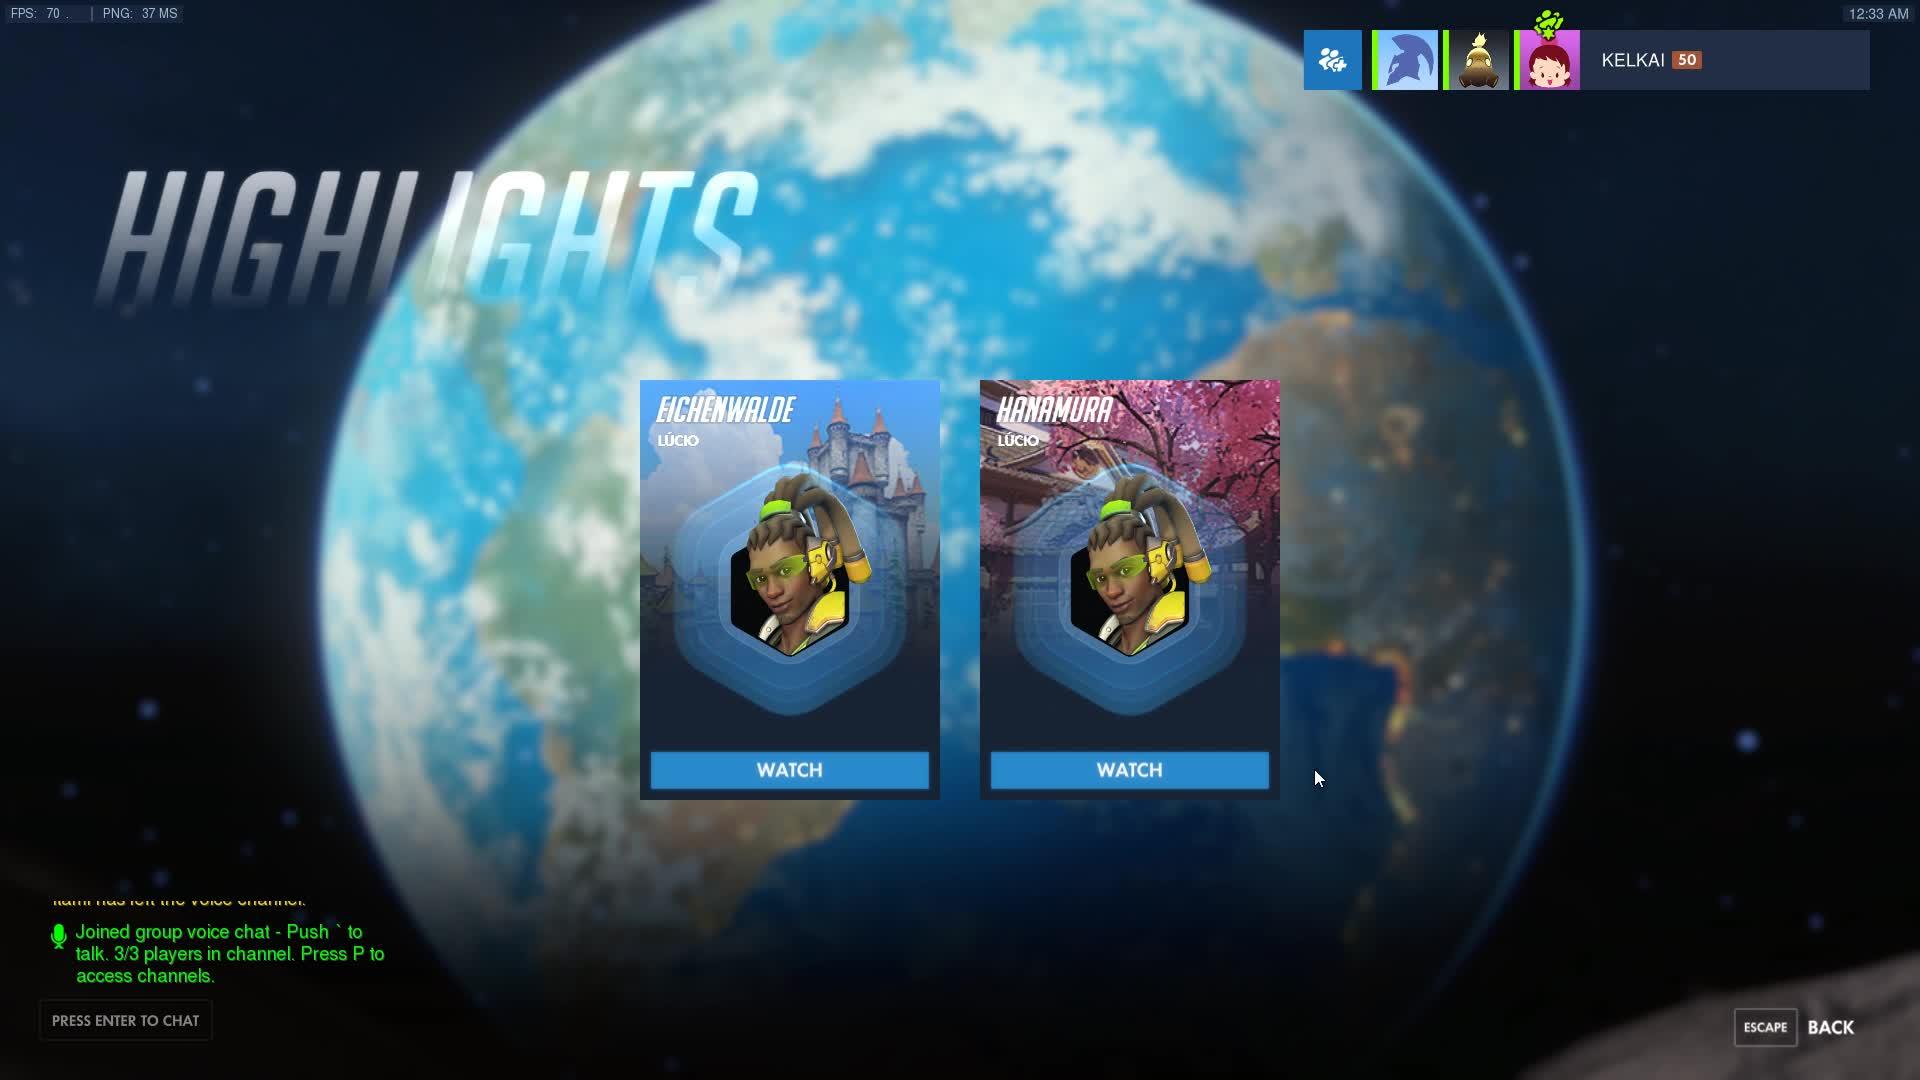 gaming_gifs, overwatch, topofreddit, Boop-oh Lucio-o GIFs